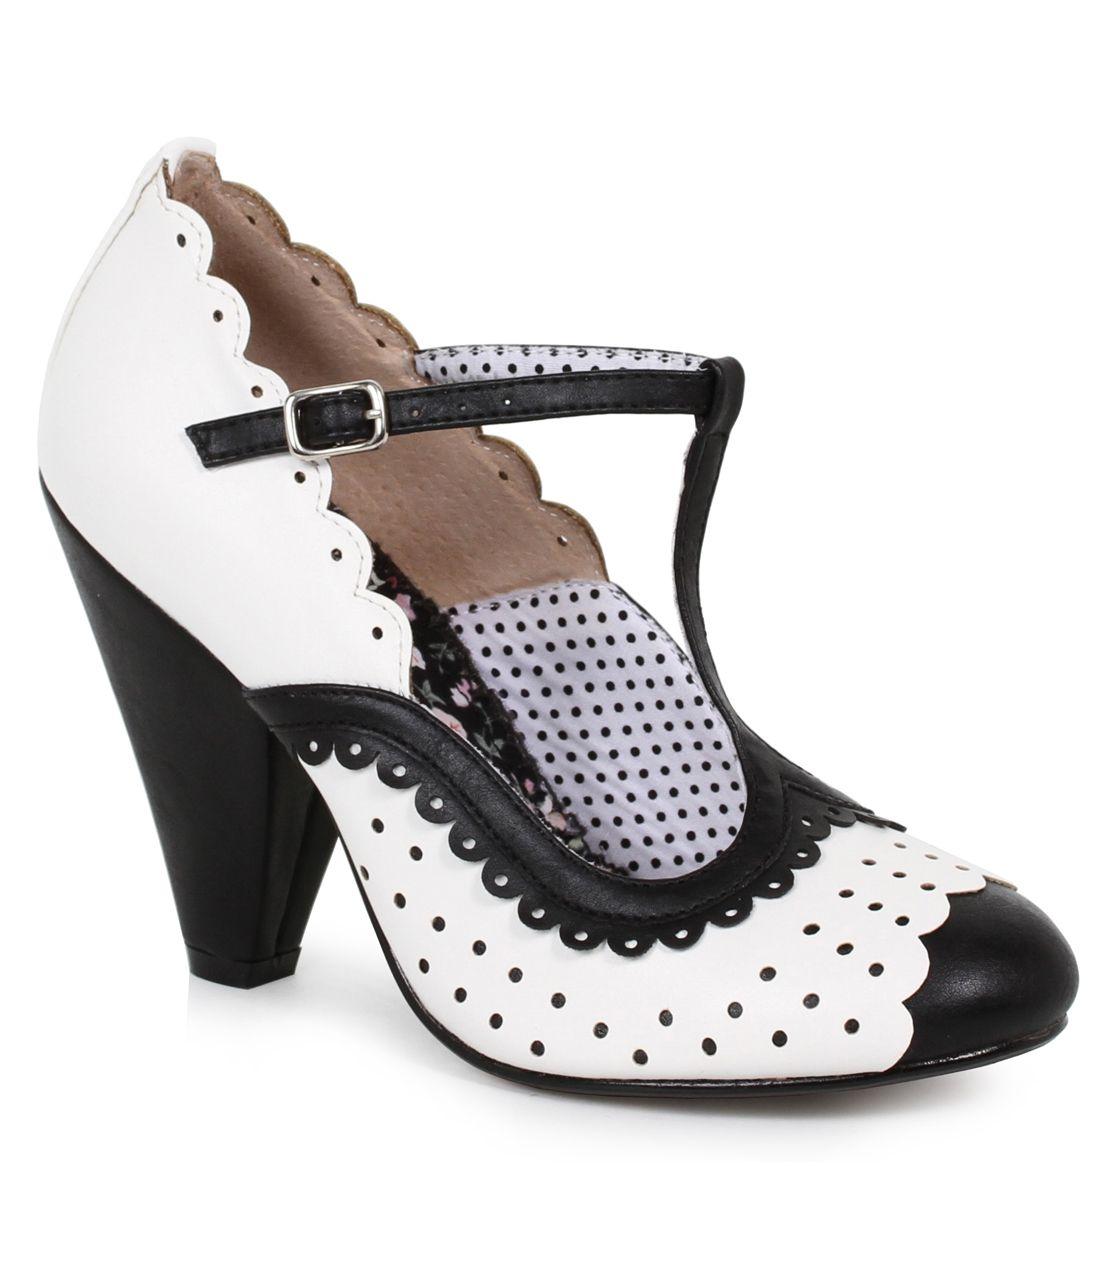 b42eb715e0fb Vintage Style Shoes